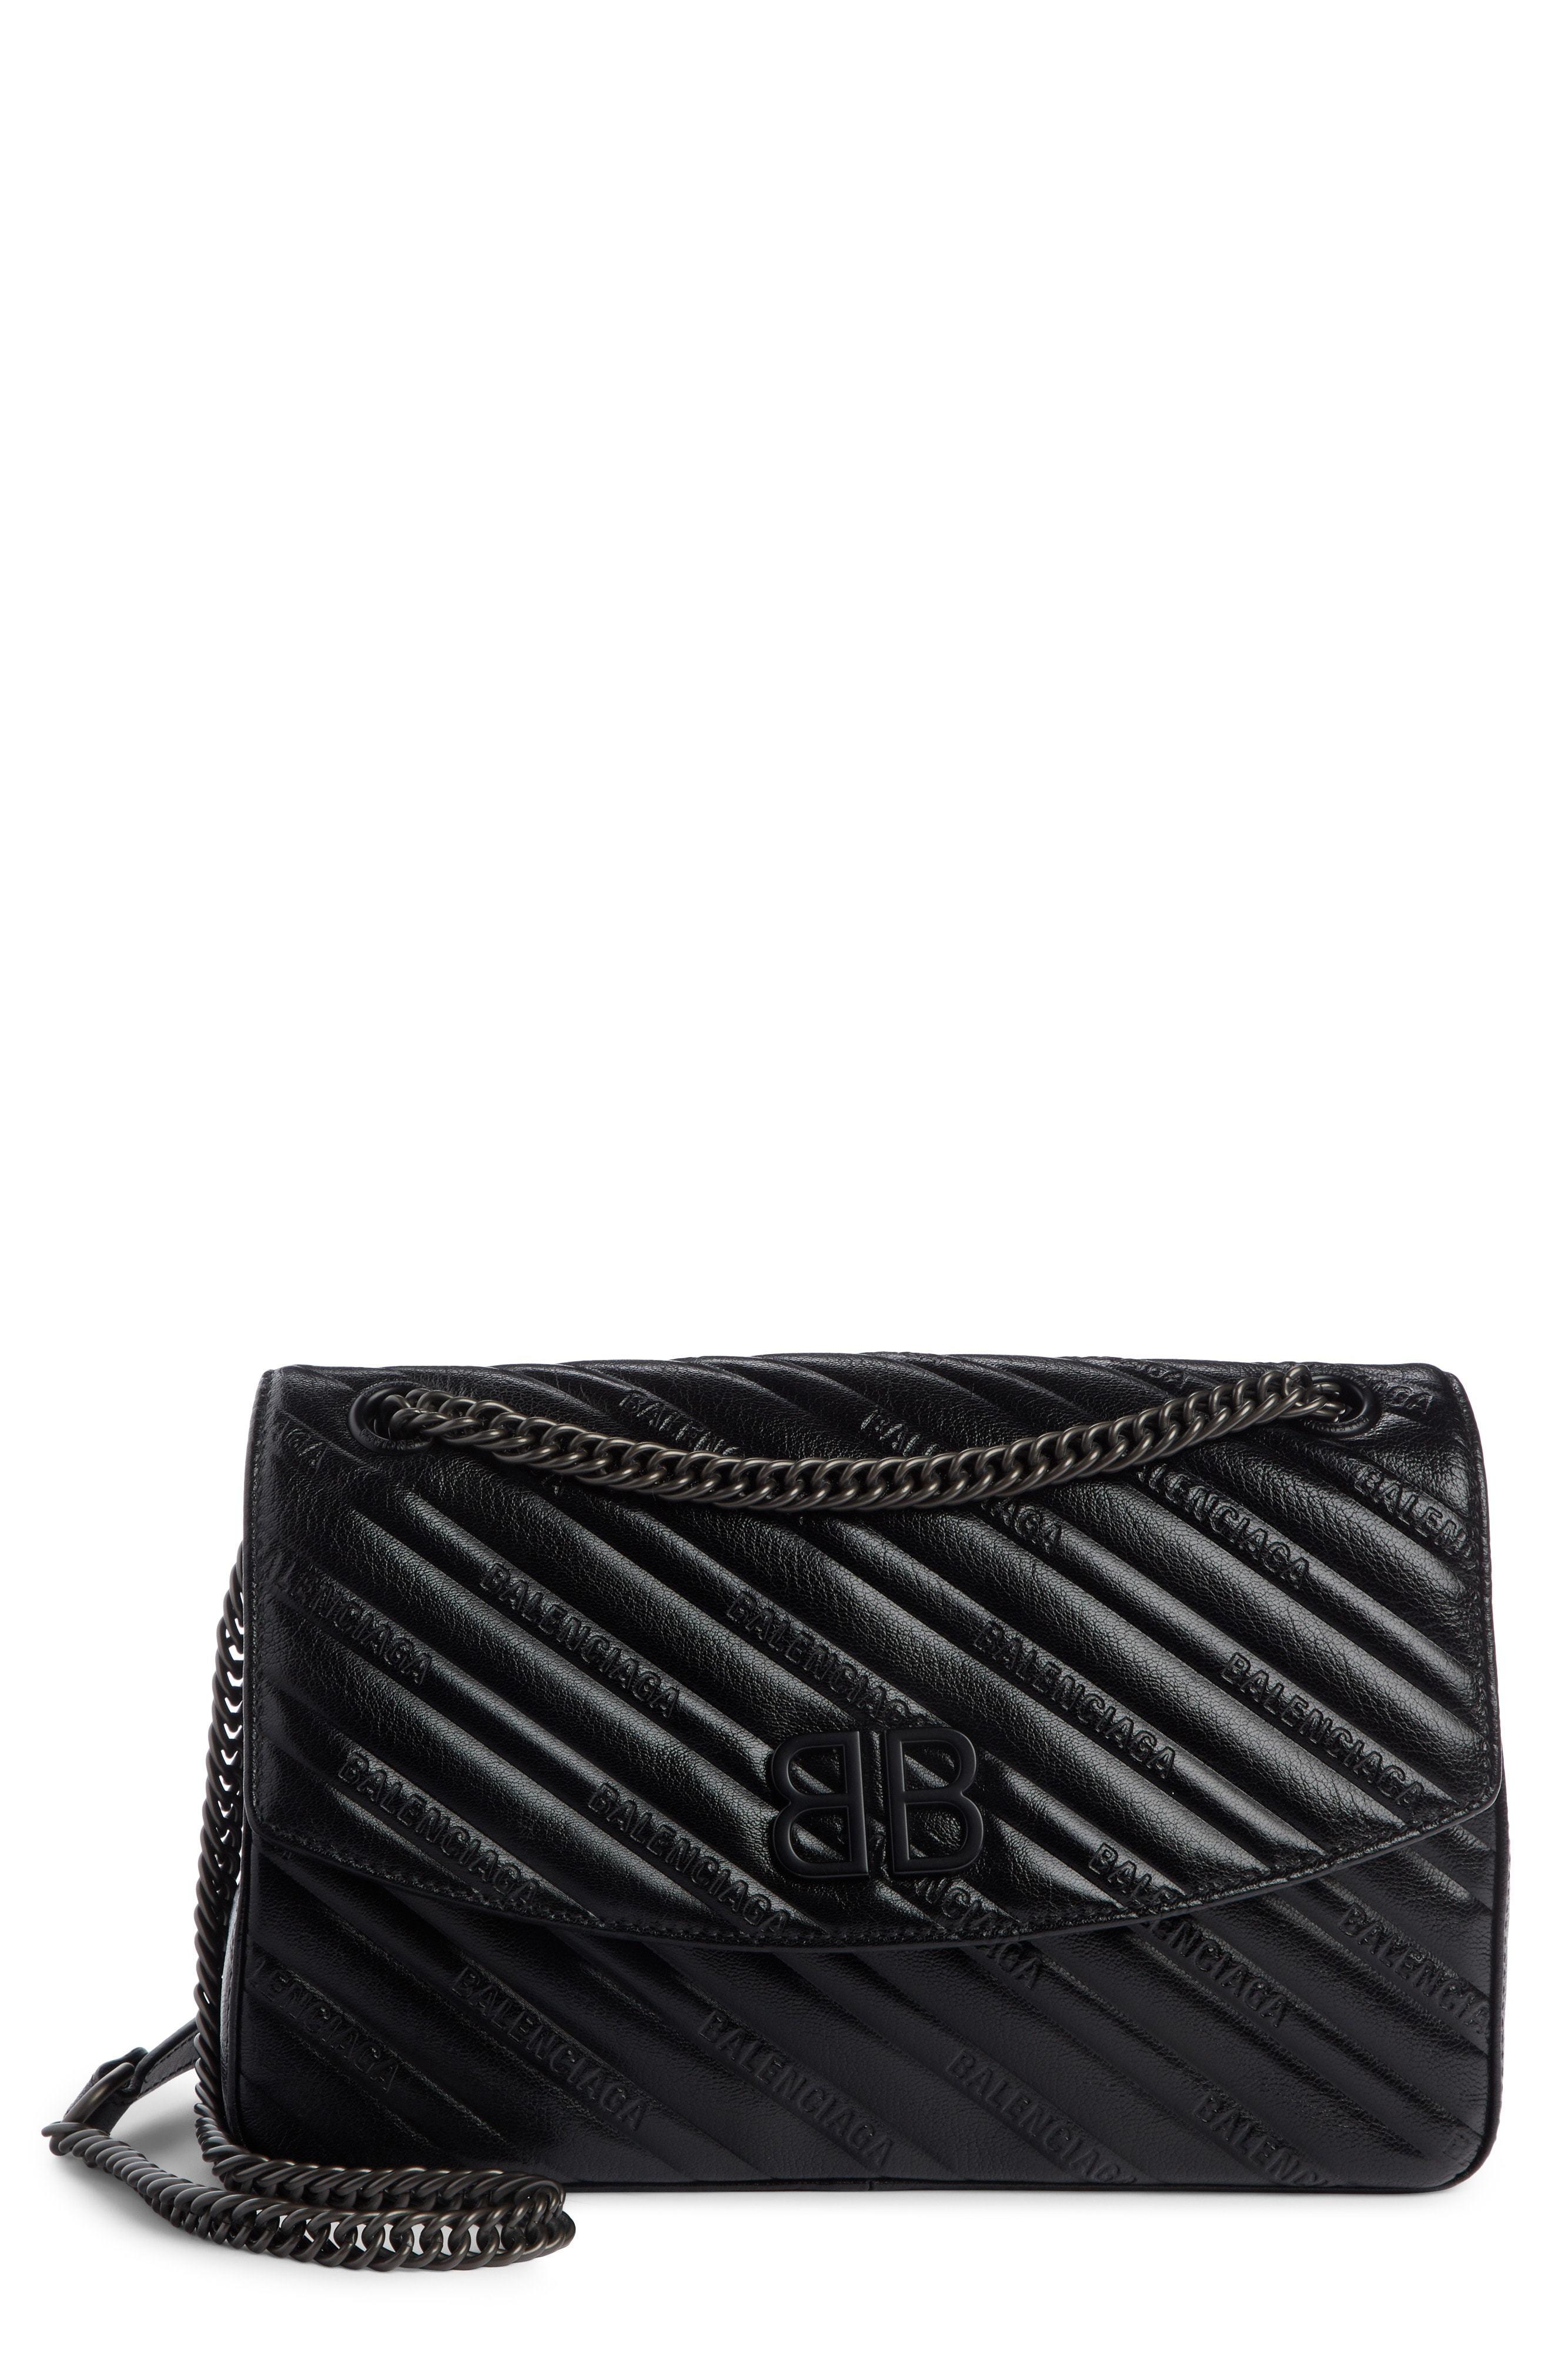 73b2c107f594bc Balenciaga Medium Bb Round Leather Shoulder Bag, $1,950   Nordstrom ...